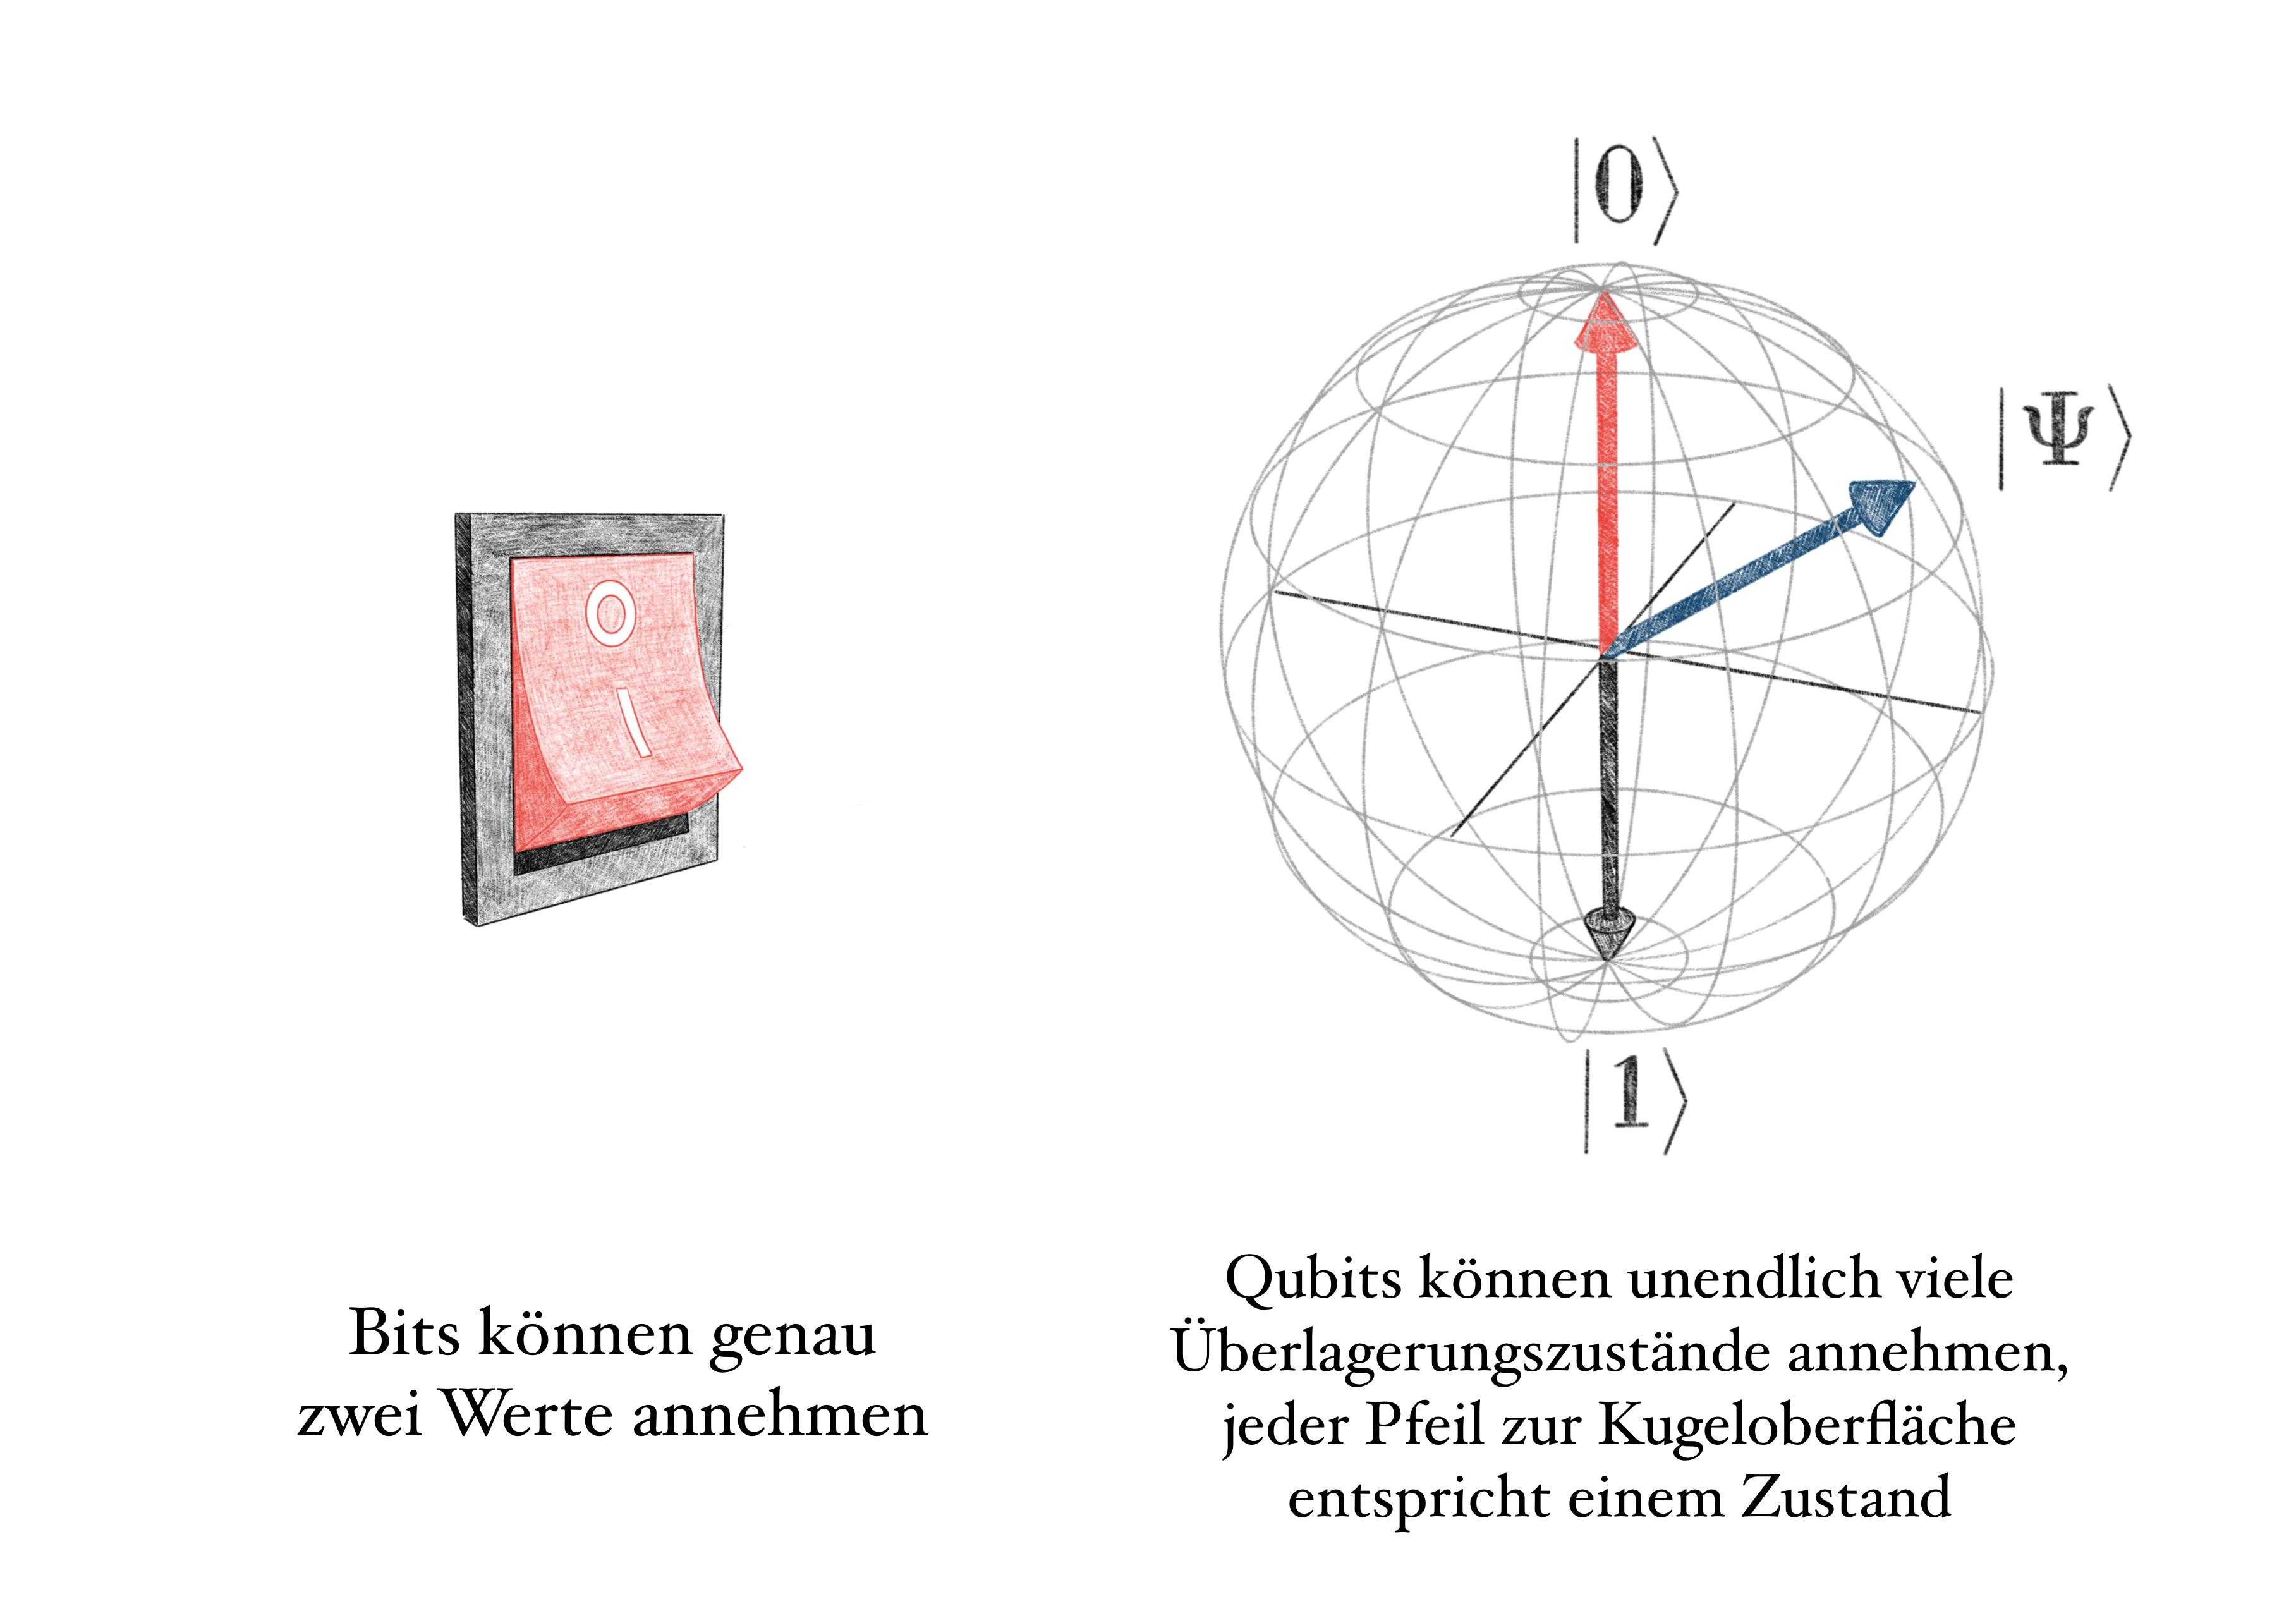 Qbits sind Bestandteile der Quantencomputer